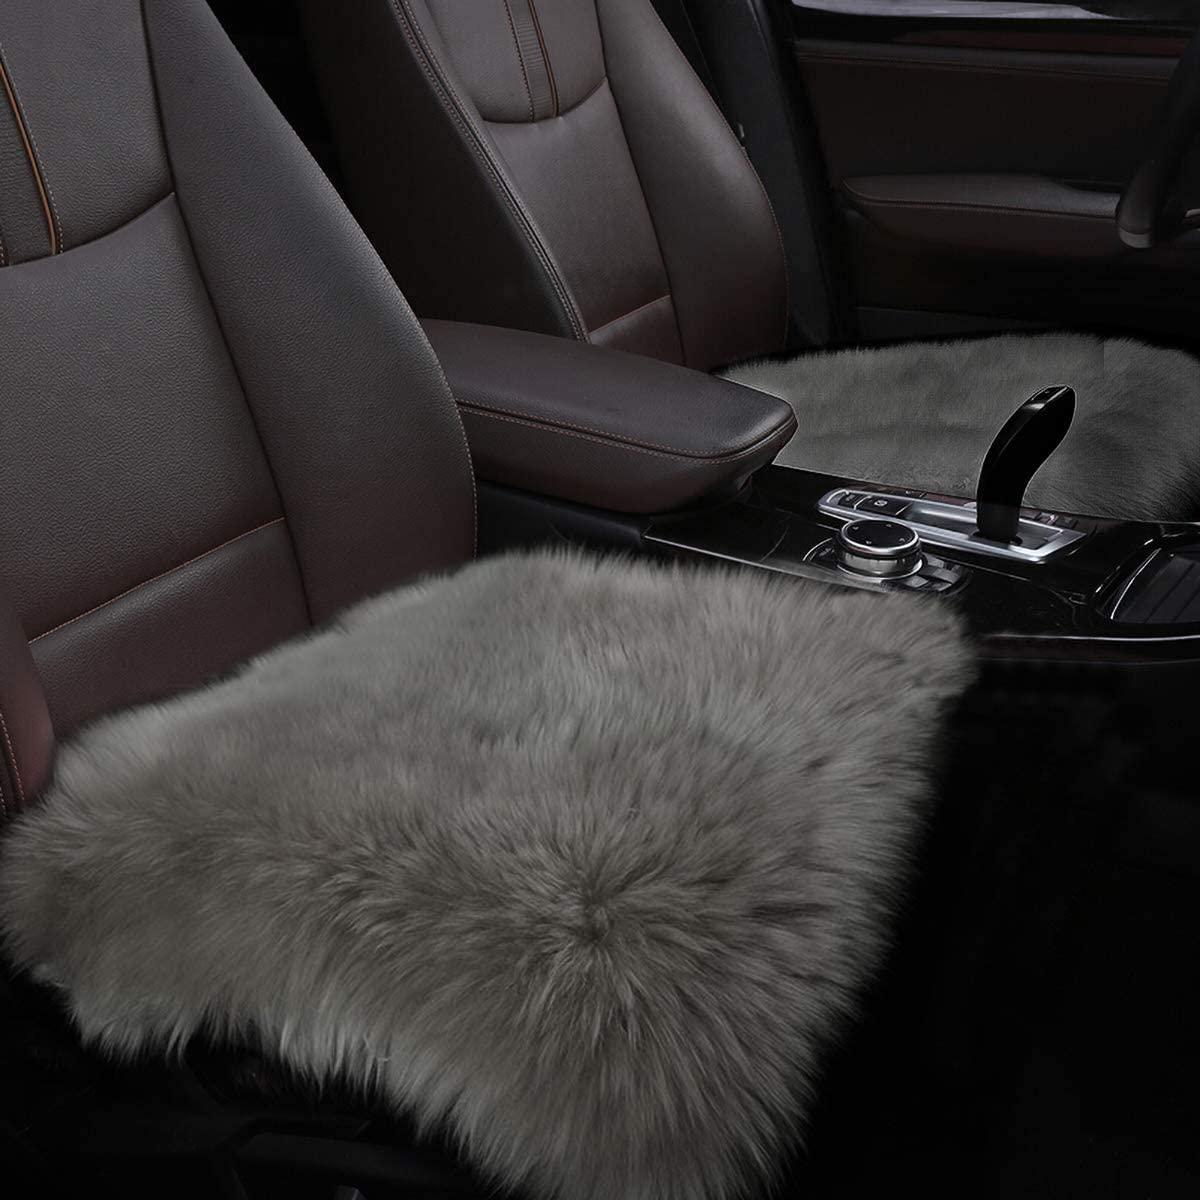 YJ.GWL Soft High Pile Grey Faux Sheepskin Fur Chair Sofa Cover (20''x20''), Square Area Rugs Seat Car Cushion Throw